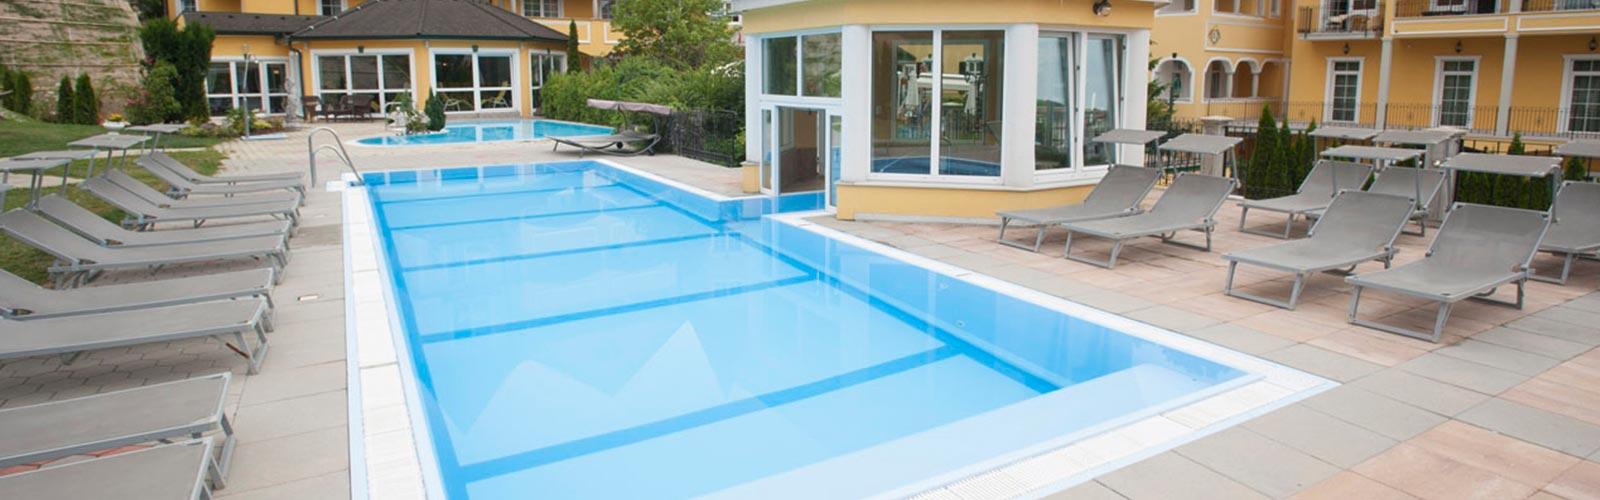 S&K GmbH Jacuzzi Whirlpool - Ein Pool